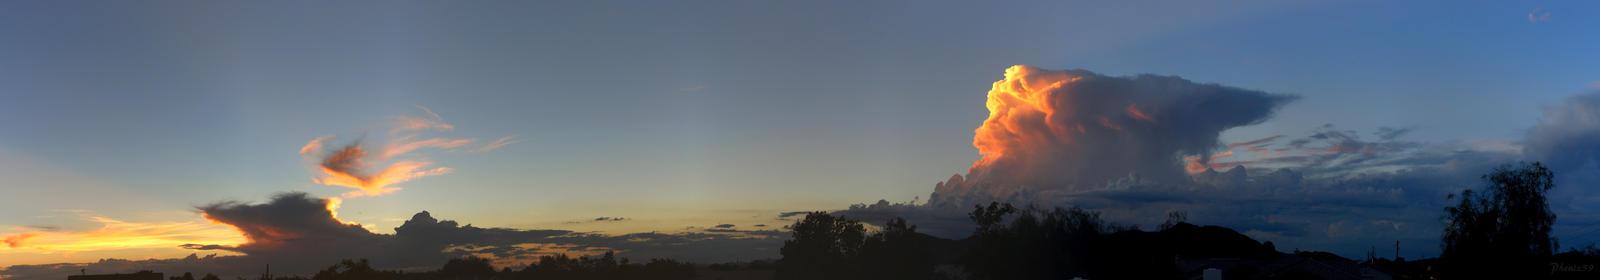 Aug 4th Sunset Panorama